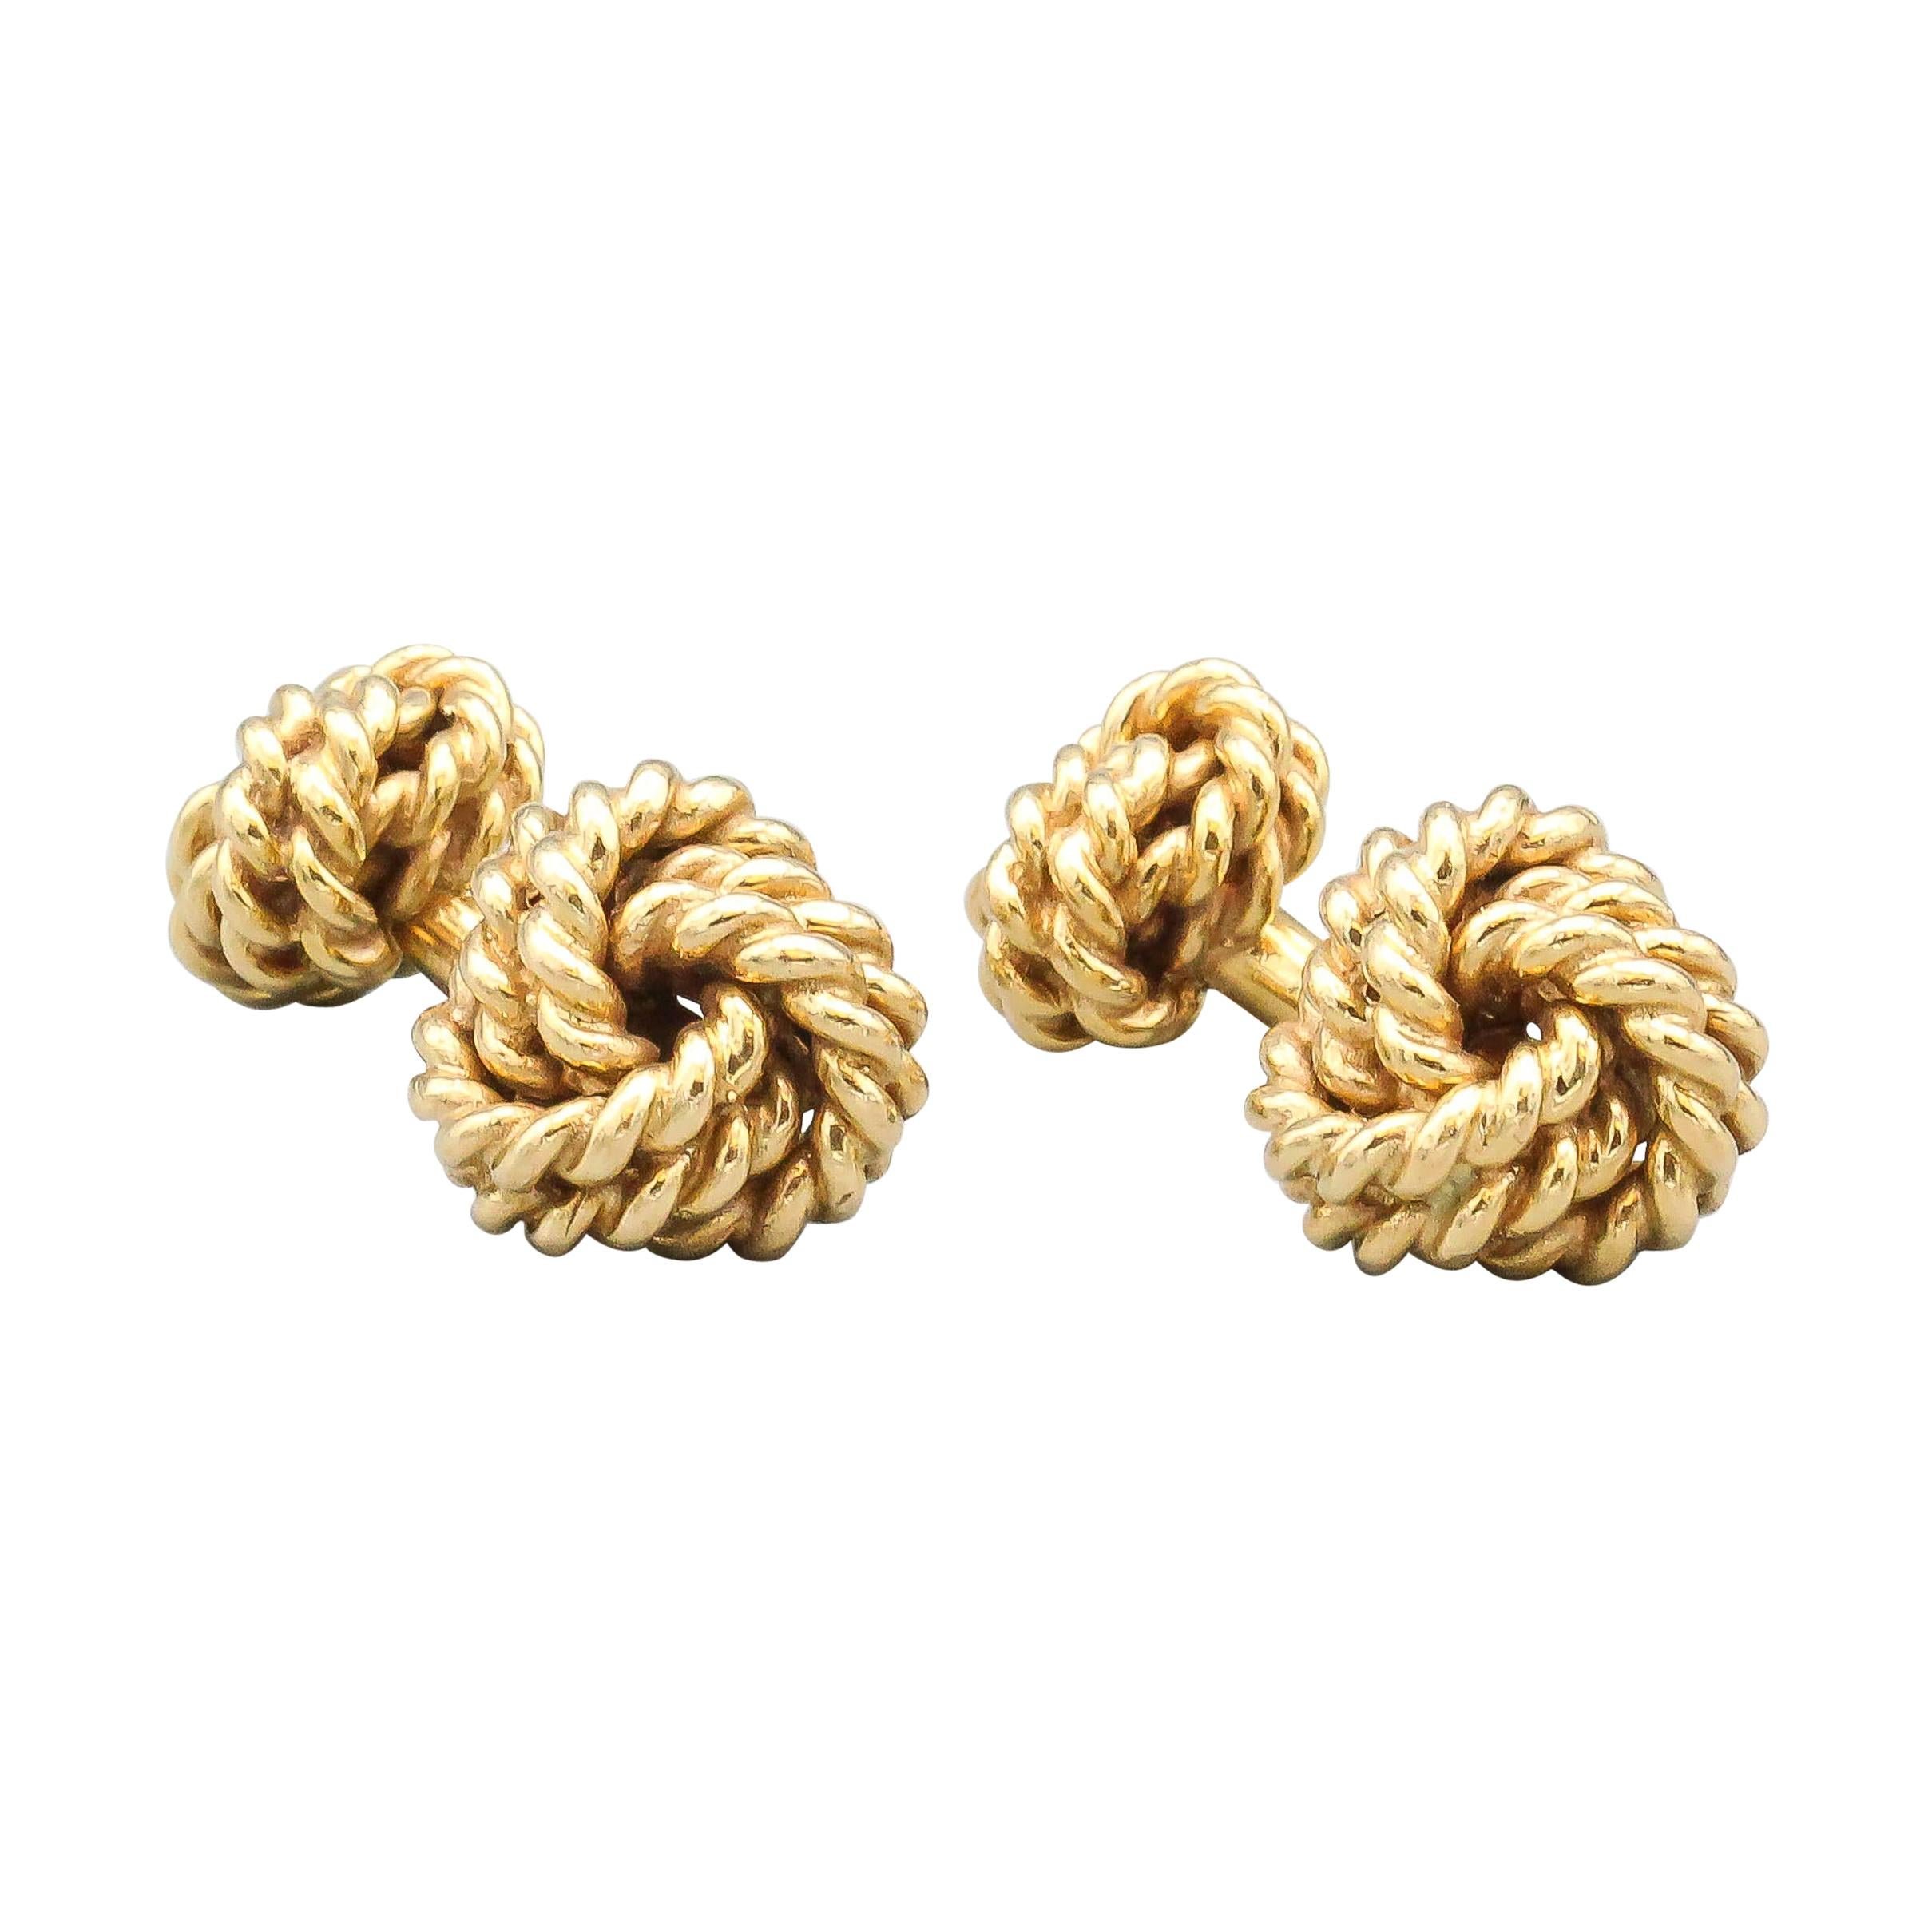 Tiffany & Co. 14k Gold Rope Knot Cufflinks